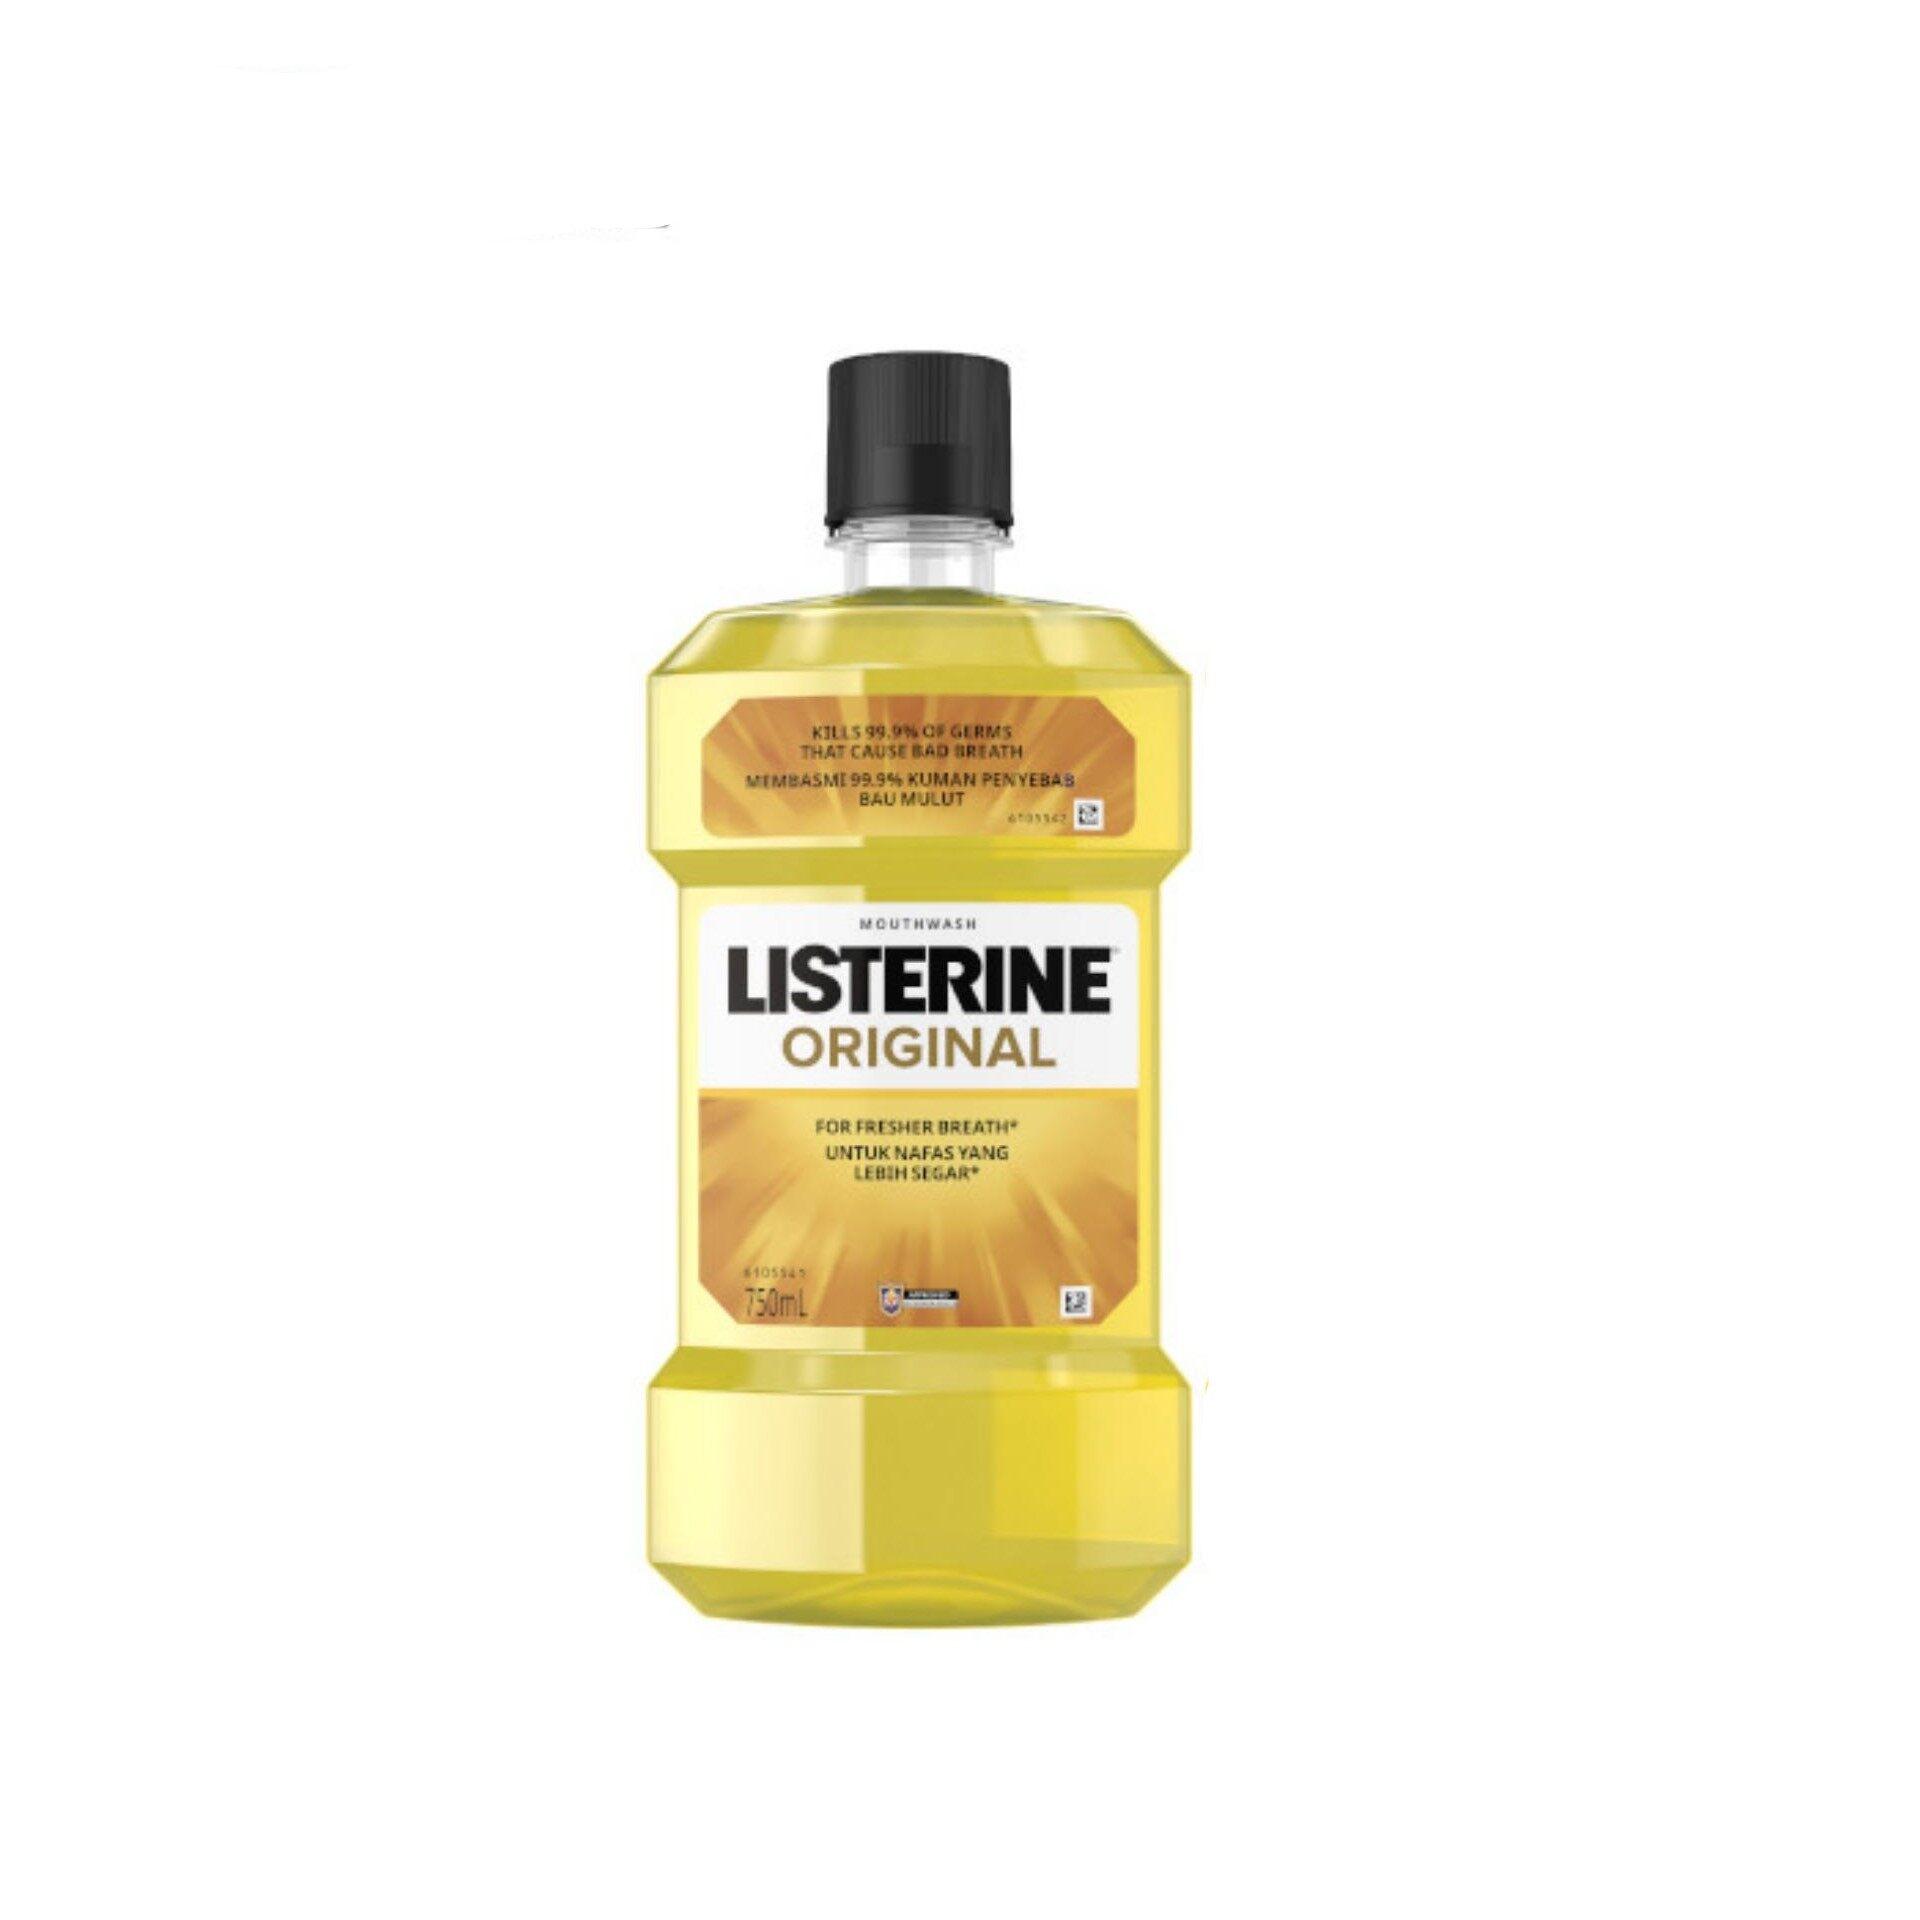 LISTERINE Mouthwash 750ml - Original